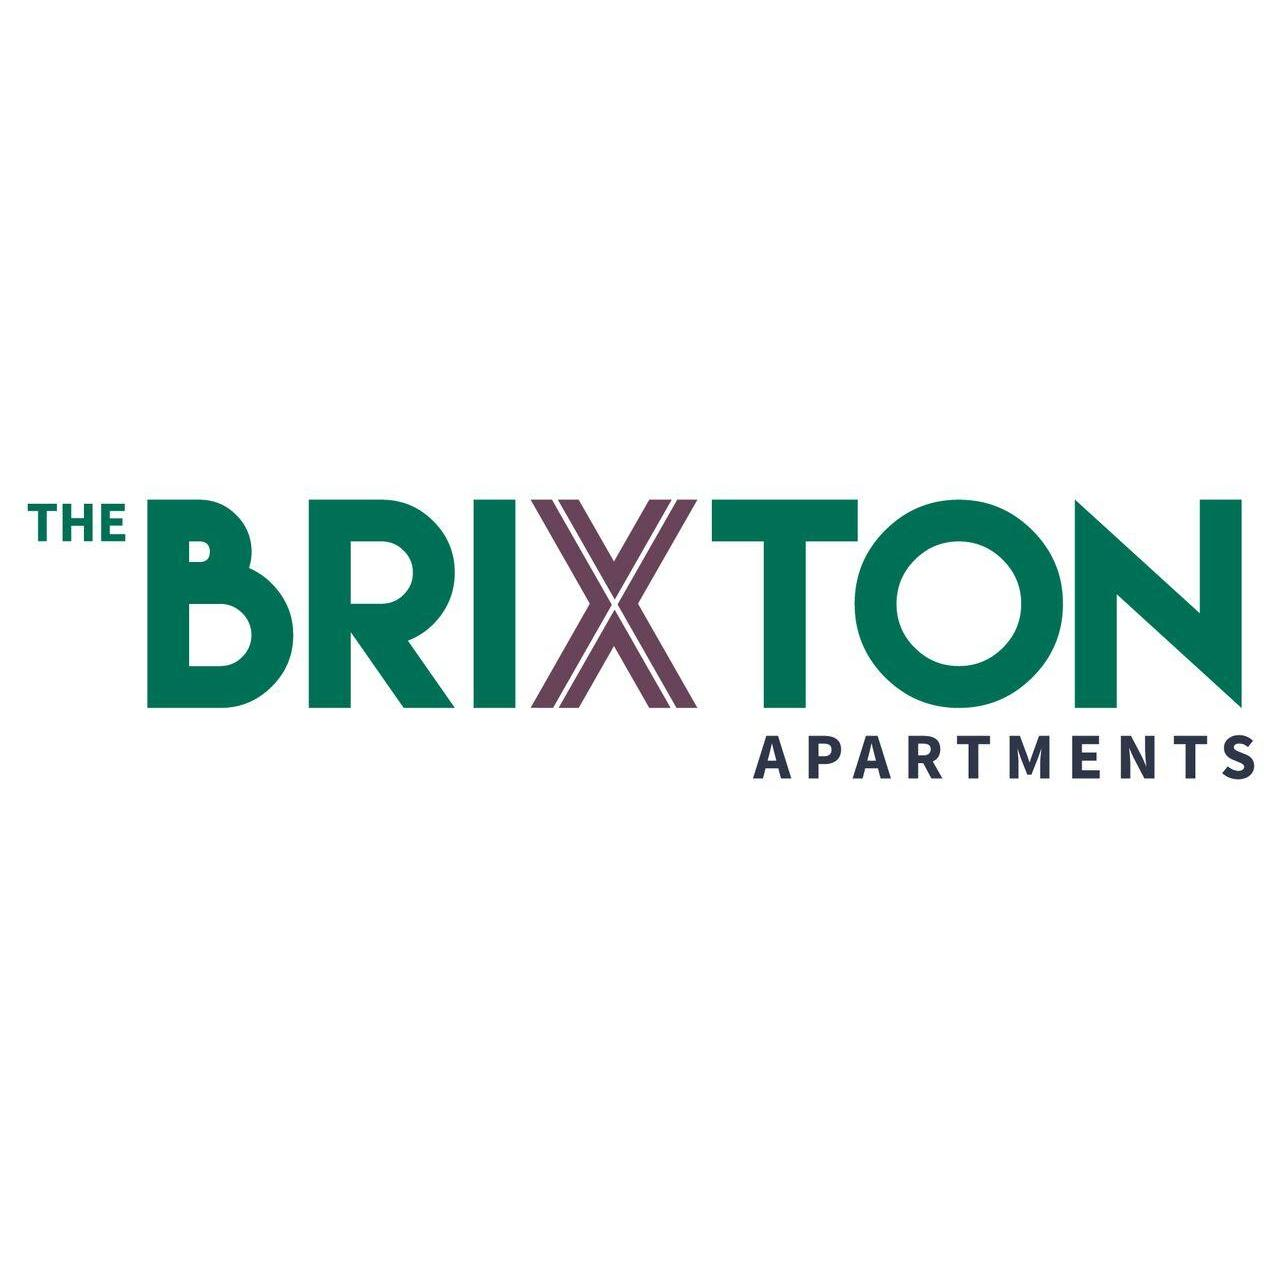 The Brixton Apartments